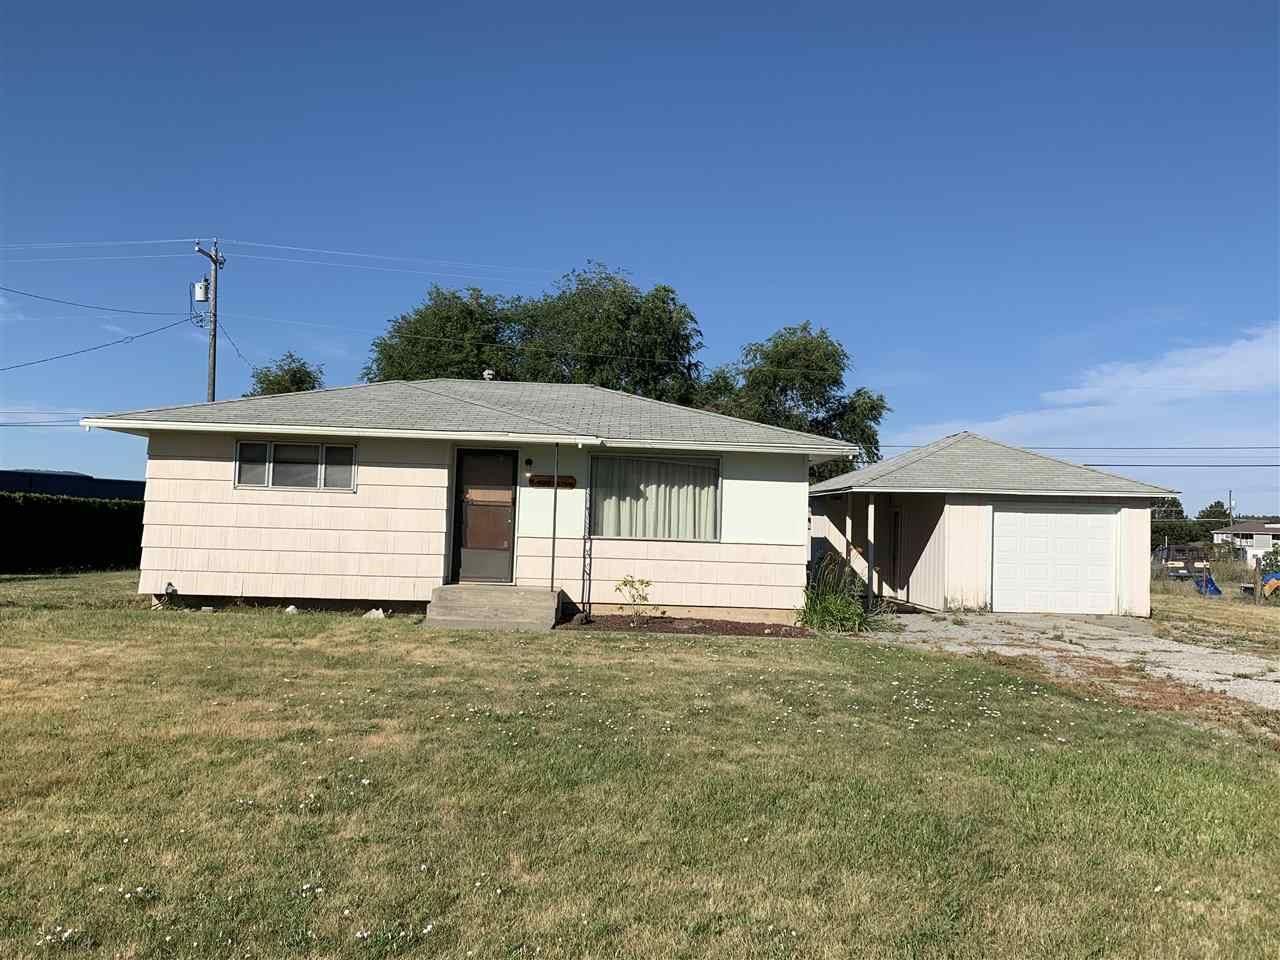 4523 N Tolford Rd, Spokane Valley, WA 99216 - #: 202019380